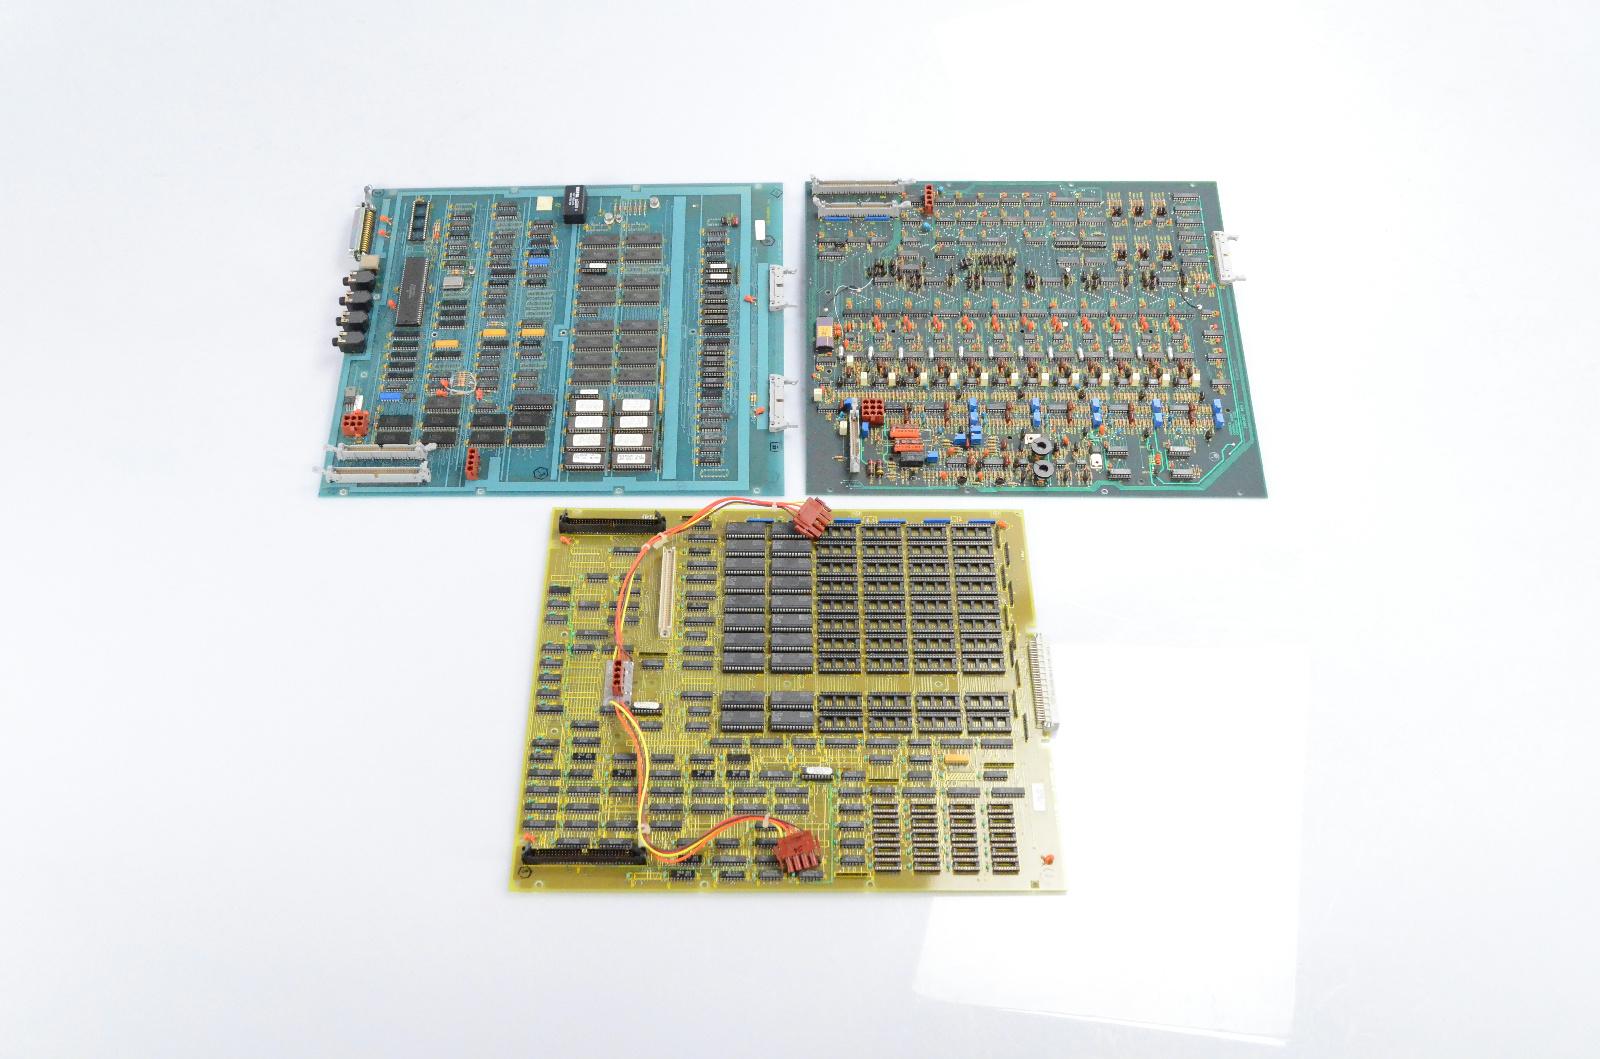 3 Kurzweil KMS 250 K250 Sync Cards Circut Board FLC2000V KMS-3300-1803 #32747